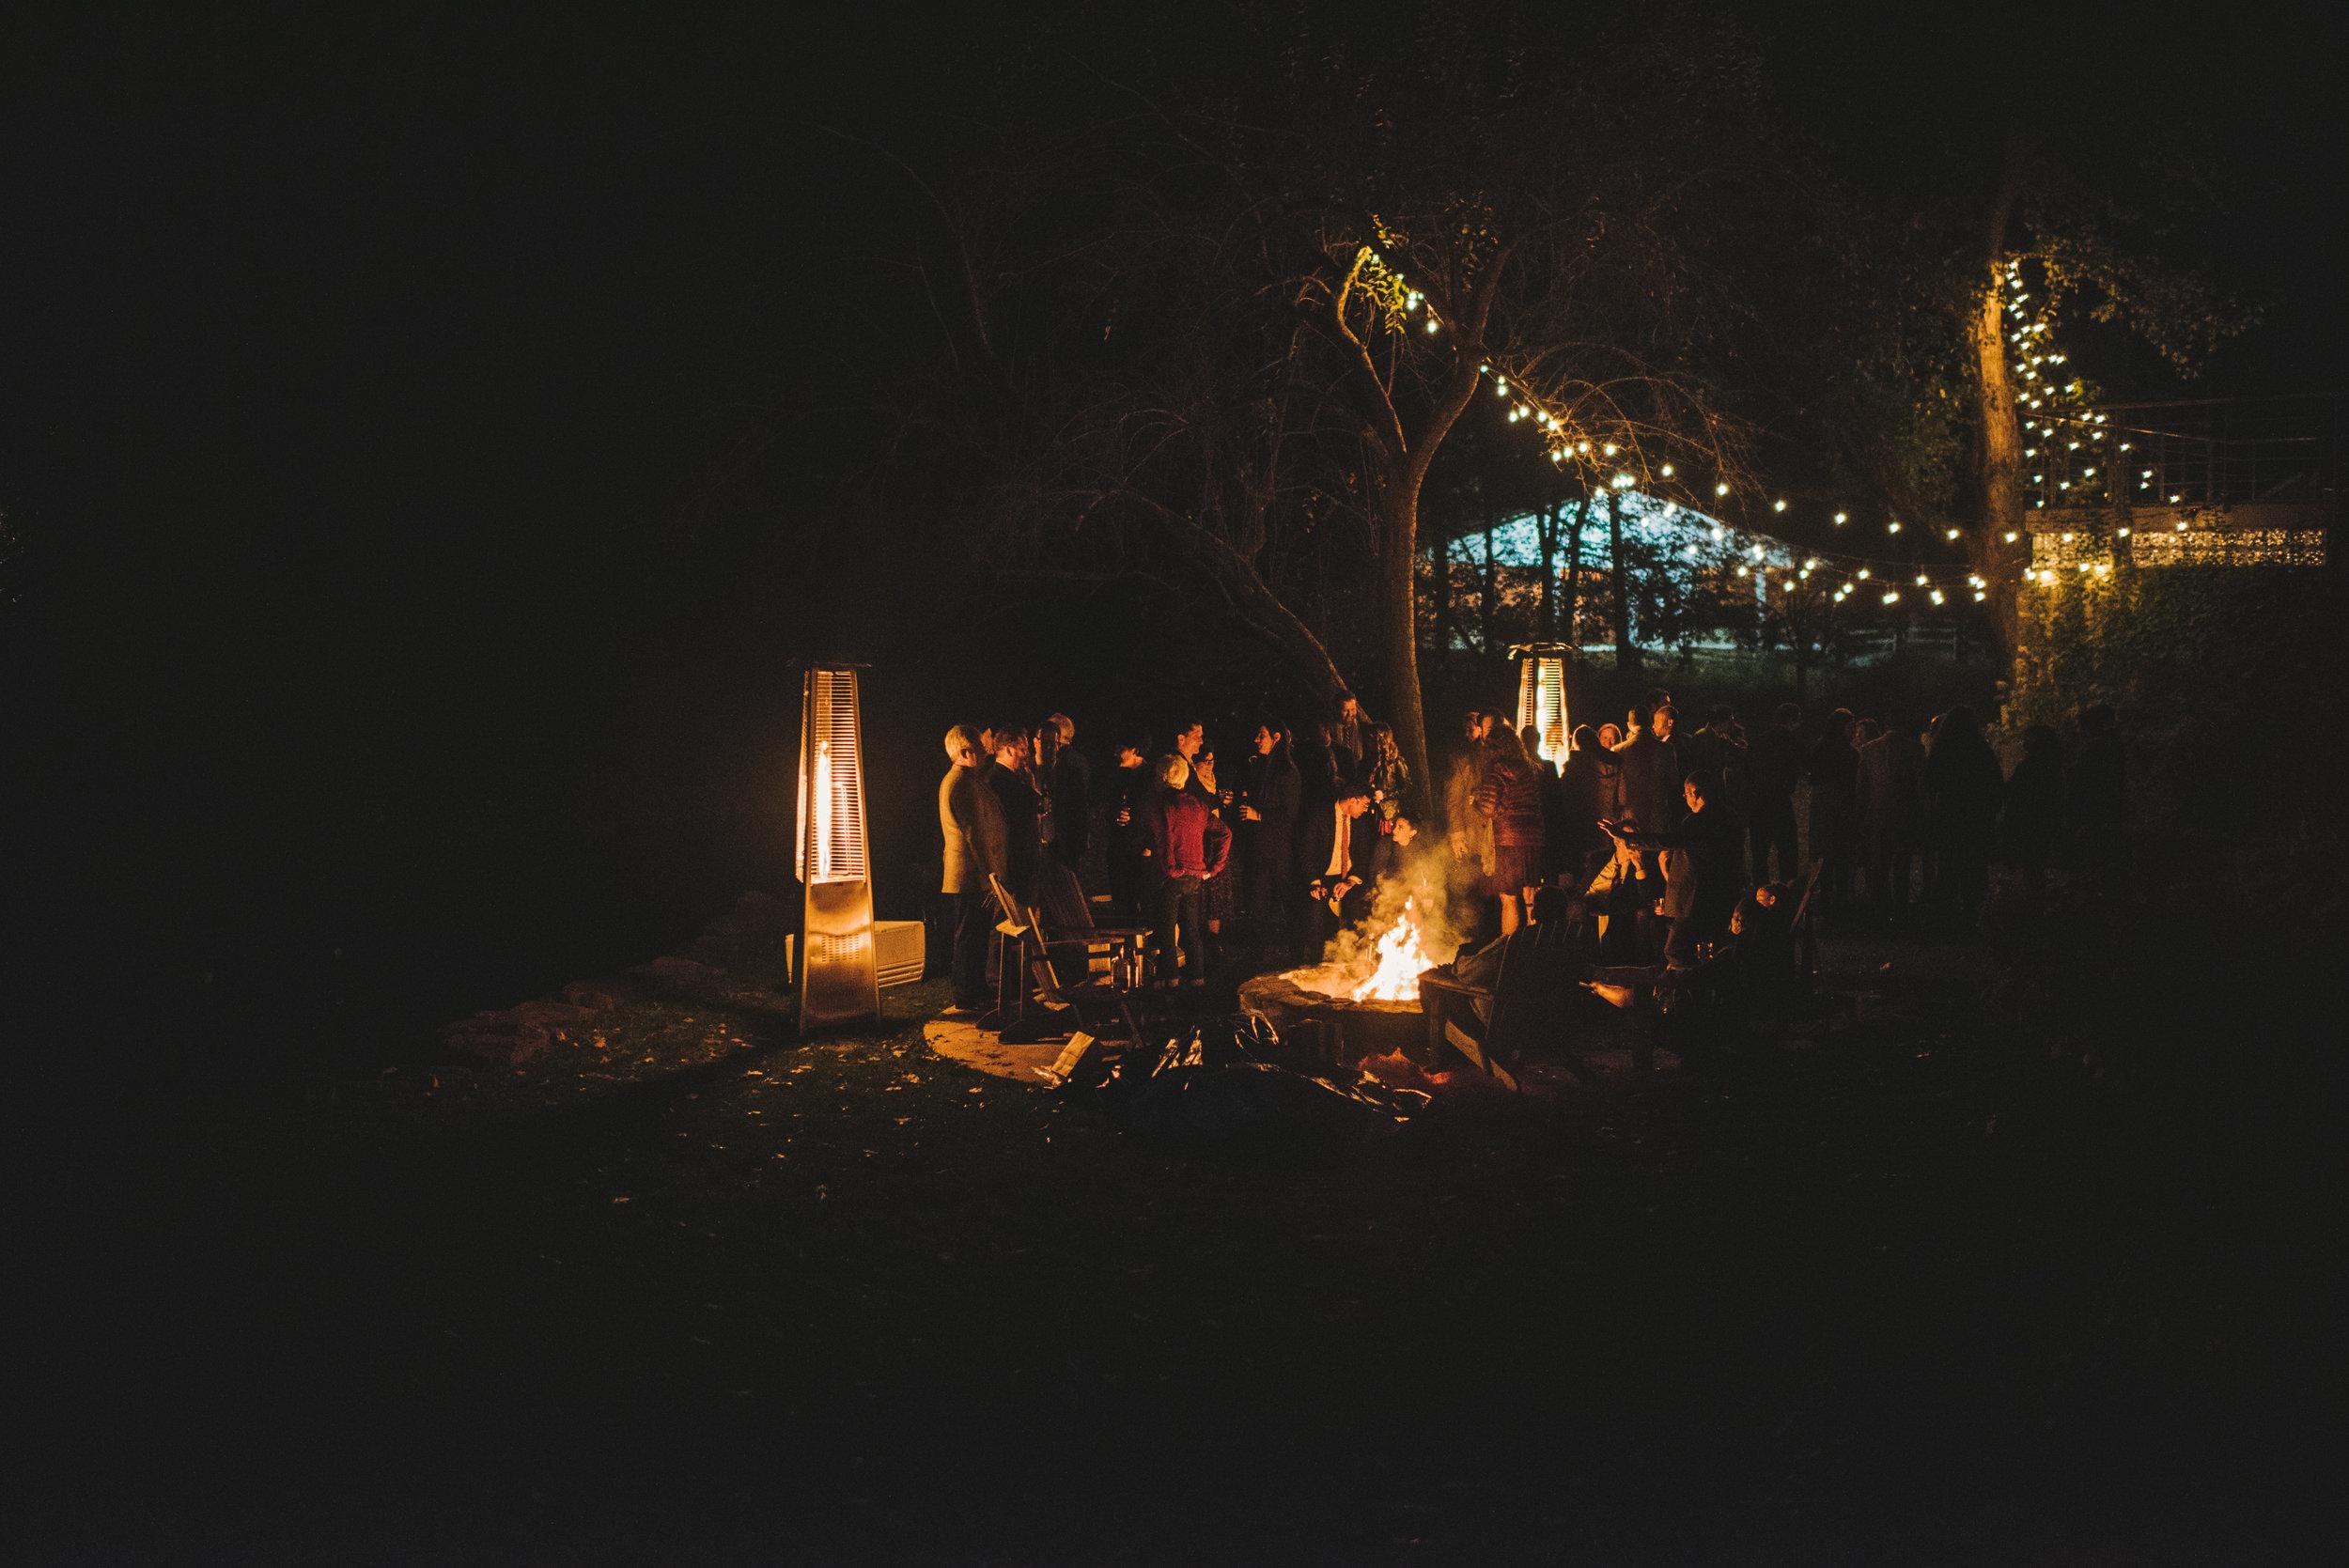 JACQUELINE & ANDREW WARSHAWER -BROOKMILL FARM FALL WEDDING - INTIMATE WEDDING PHOTOGRAPHER - TWOTWENTY by CHI-CHI AGBIM-835.jpg